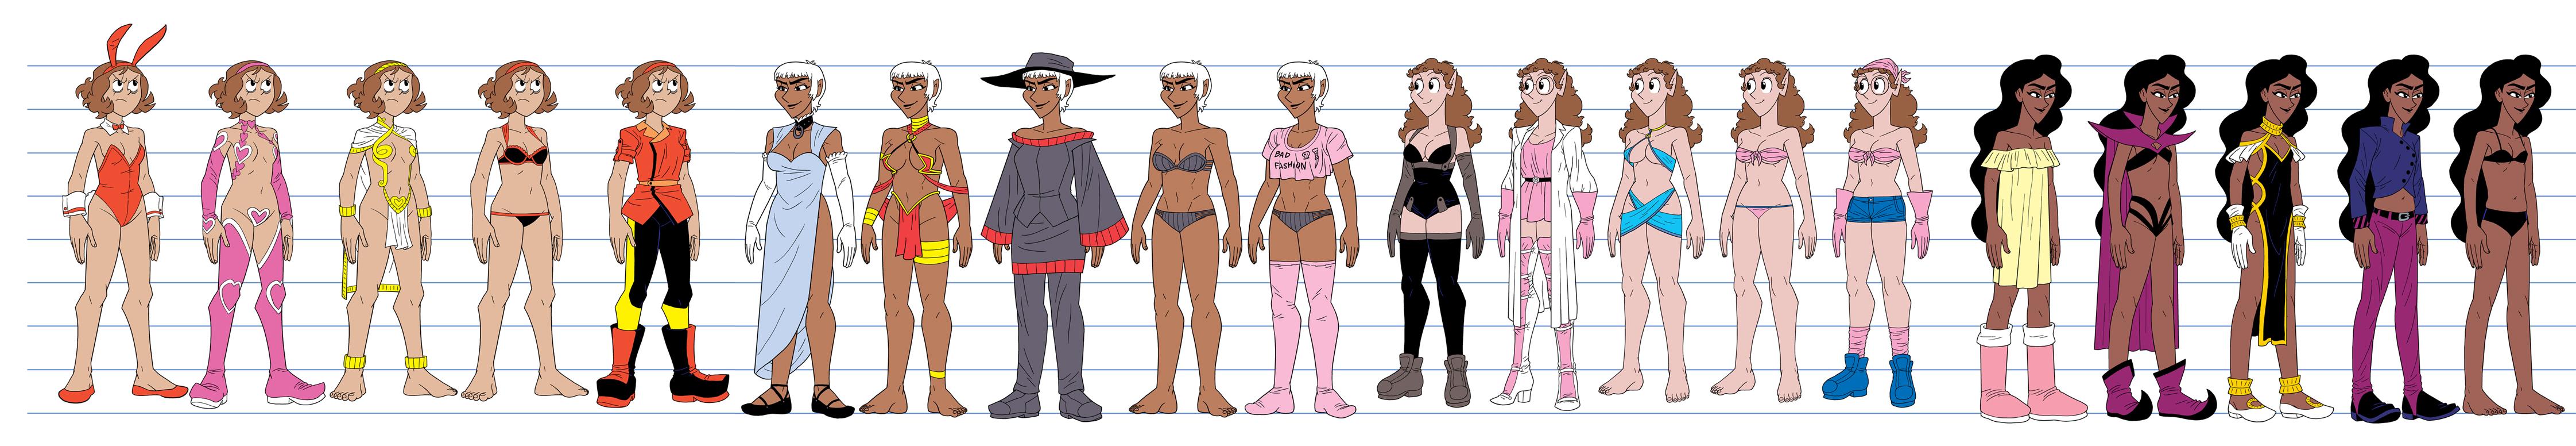 Gals Lineup